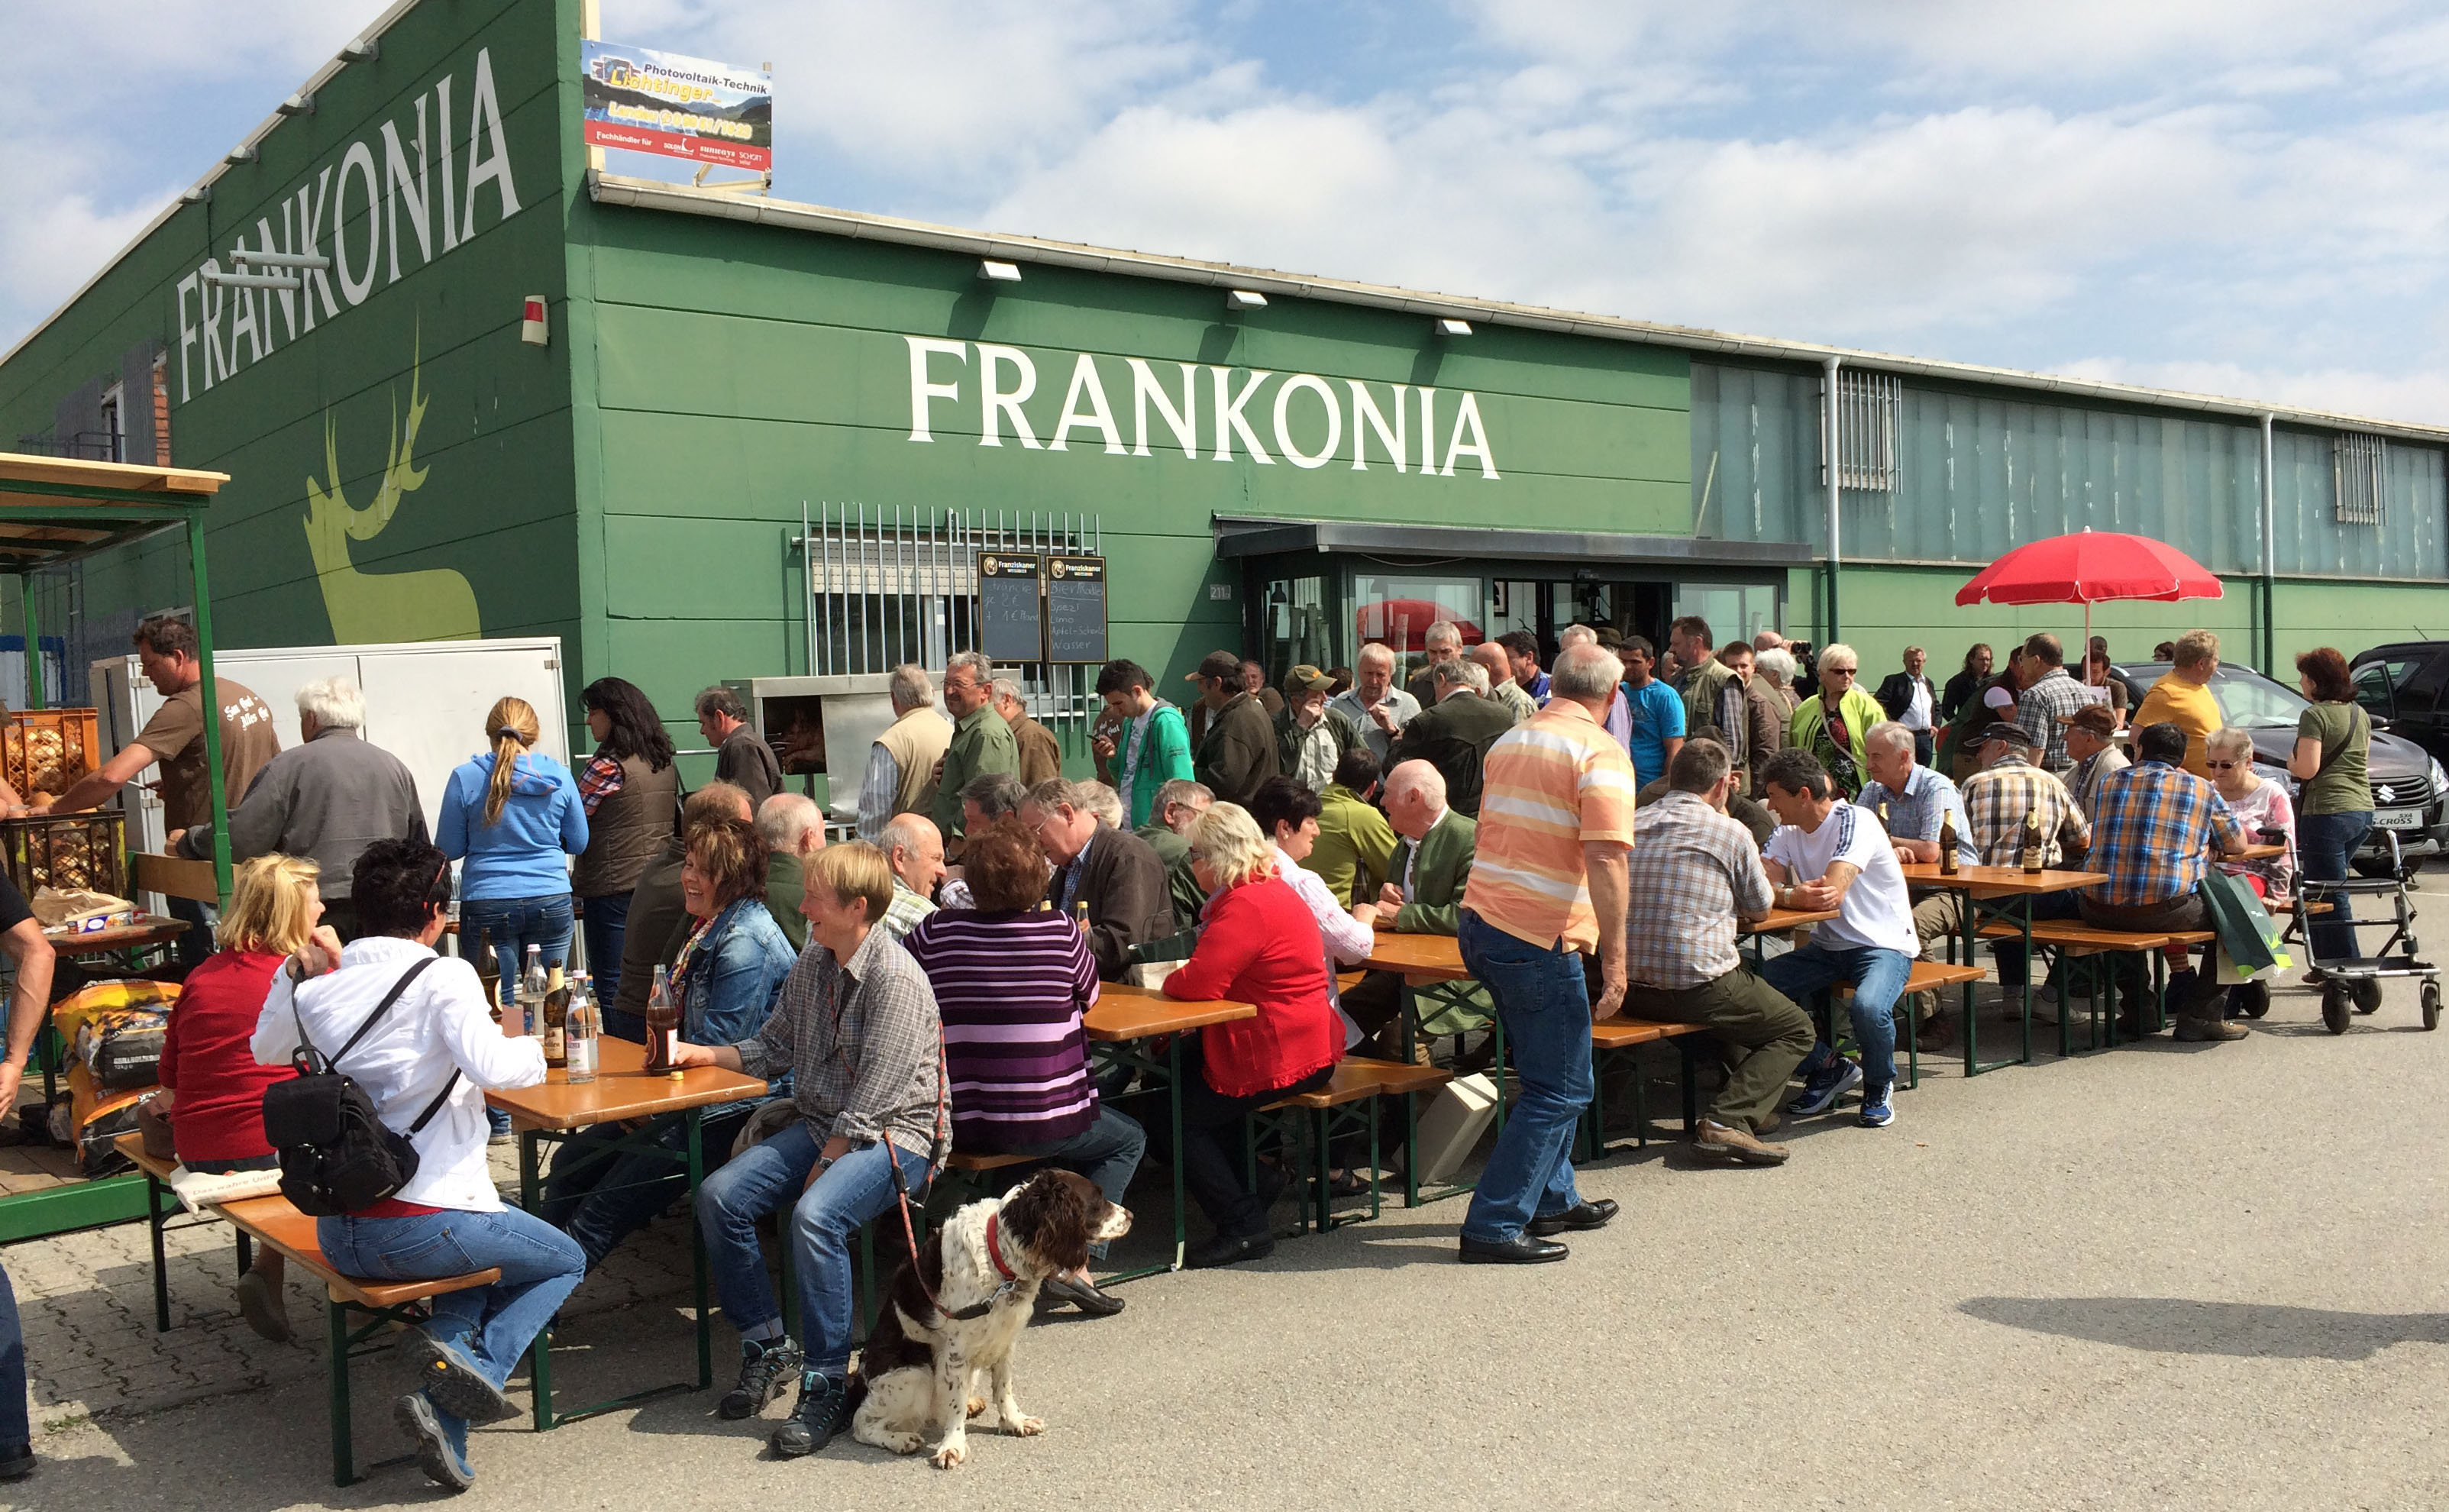 Entfernungsmesser Jagd Frankonia : Jägerfest in straubing frankonia präsentierte riesige